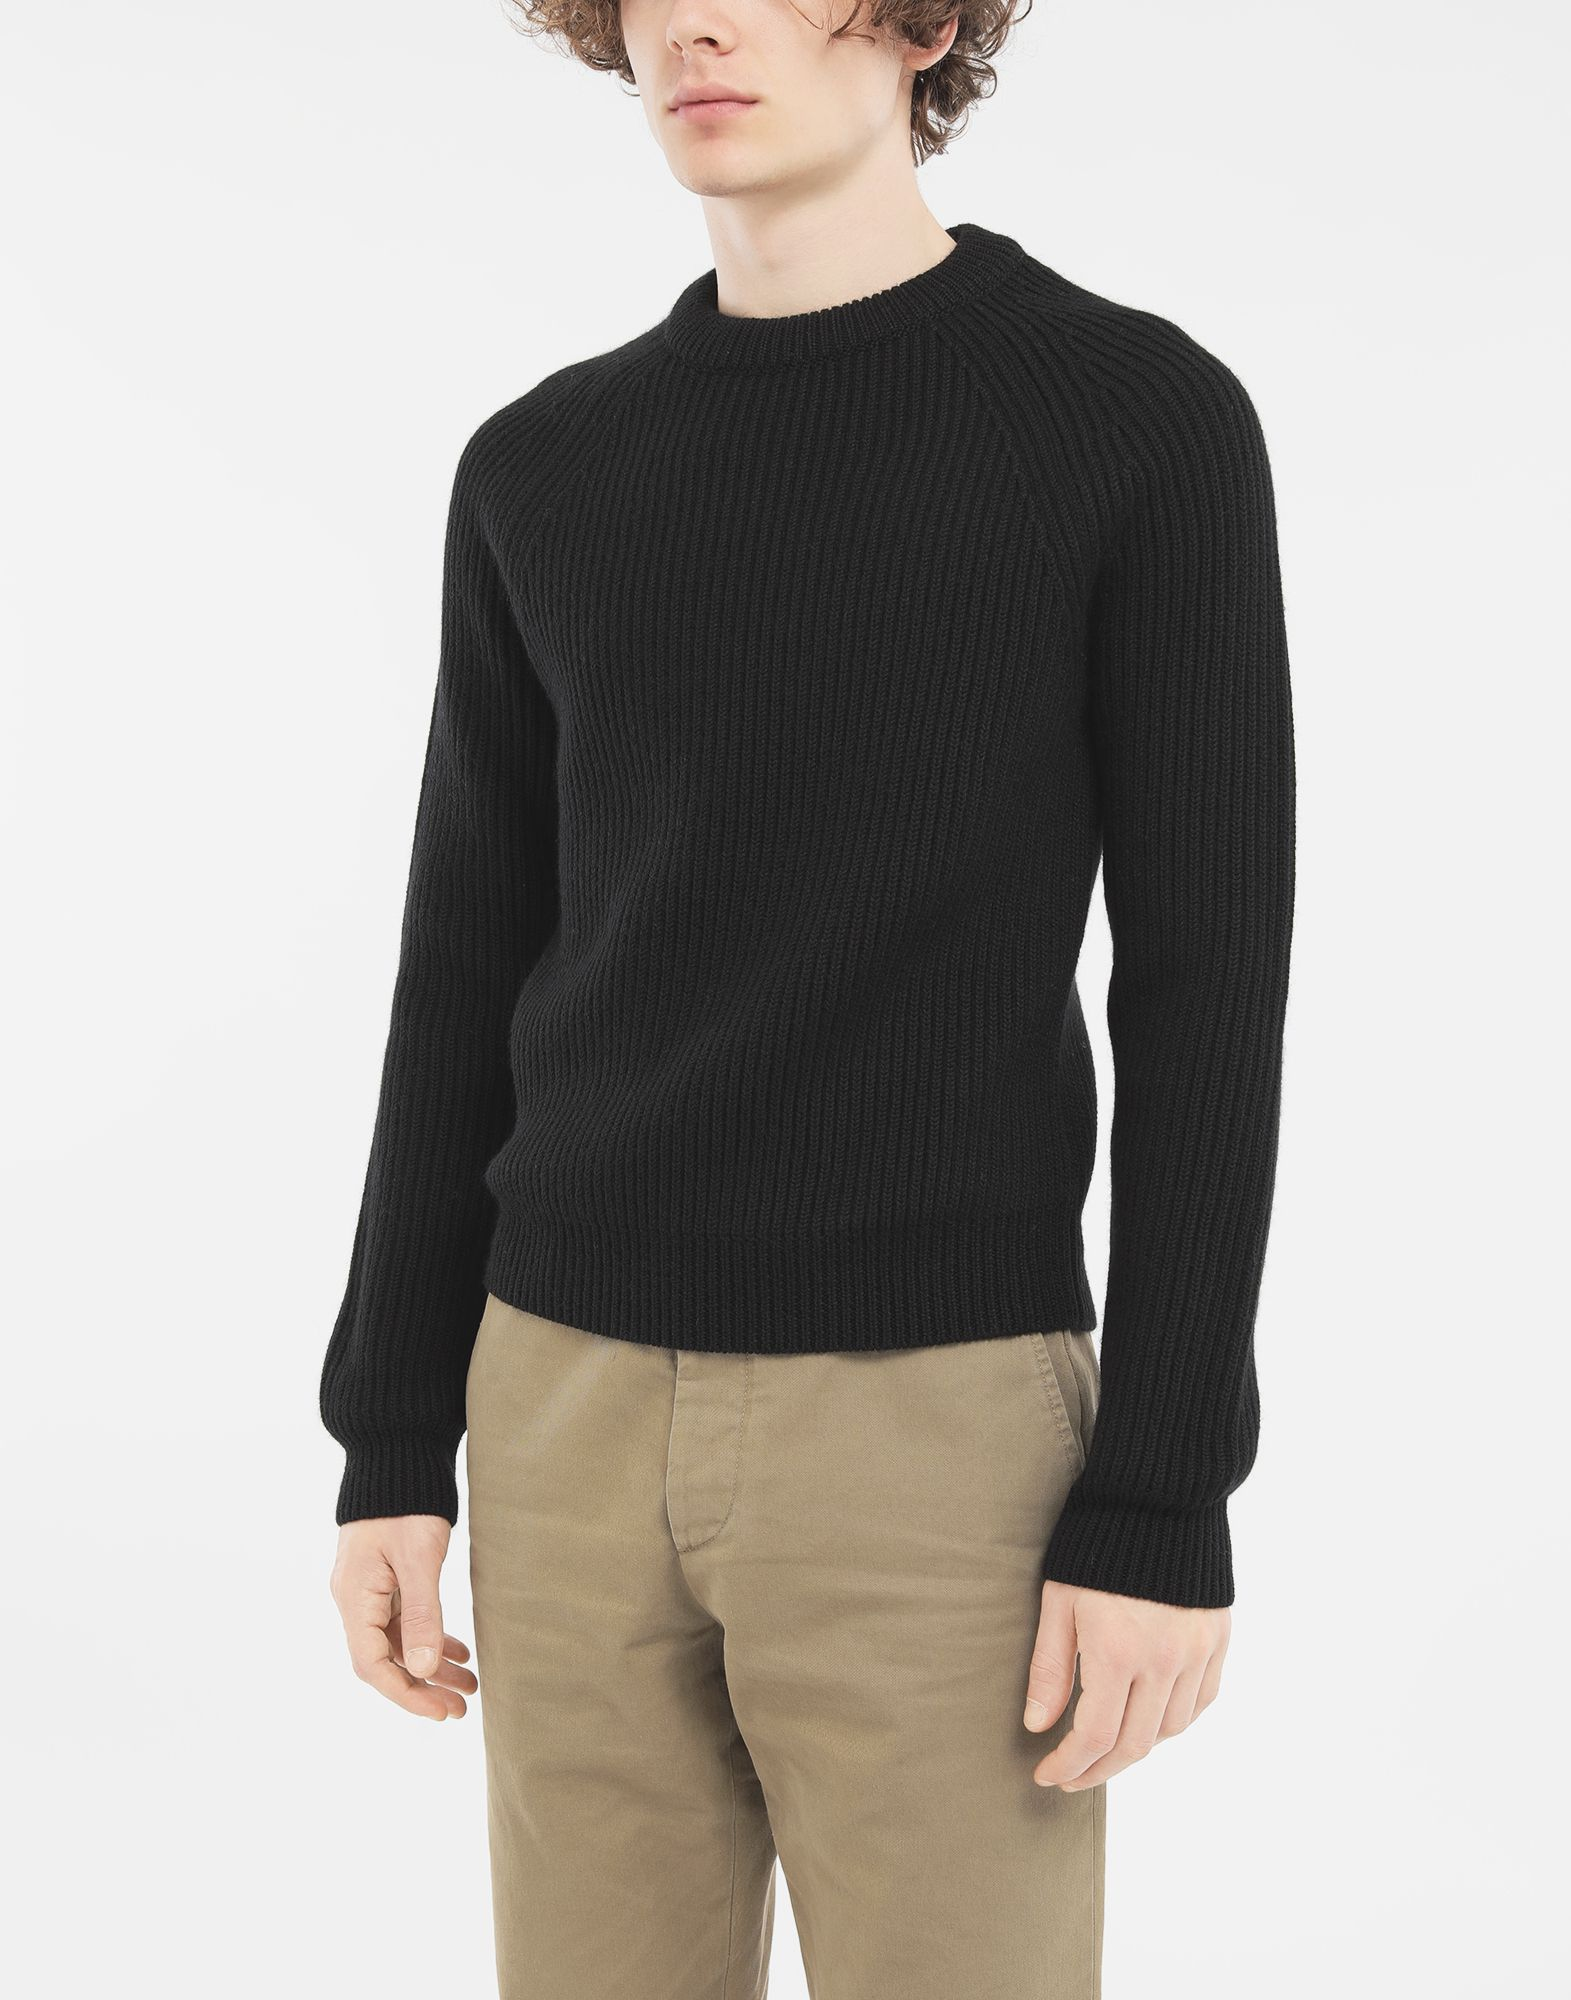 MAISON MARGIELA Ribbed sweater Crewneck Man r